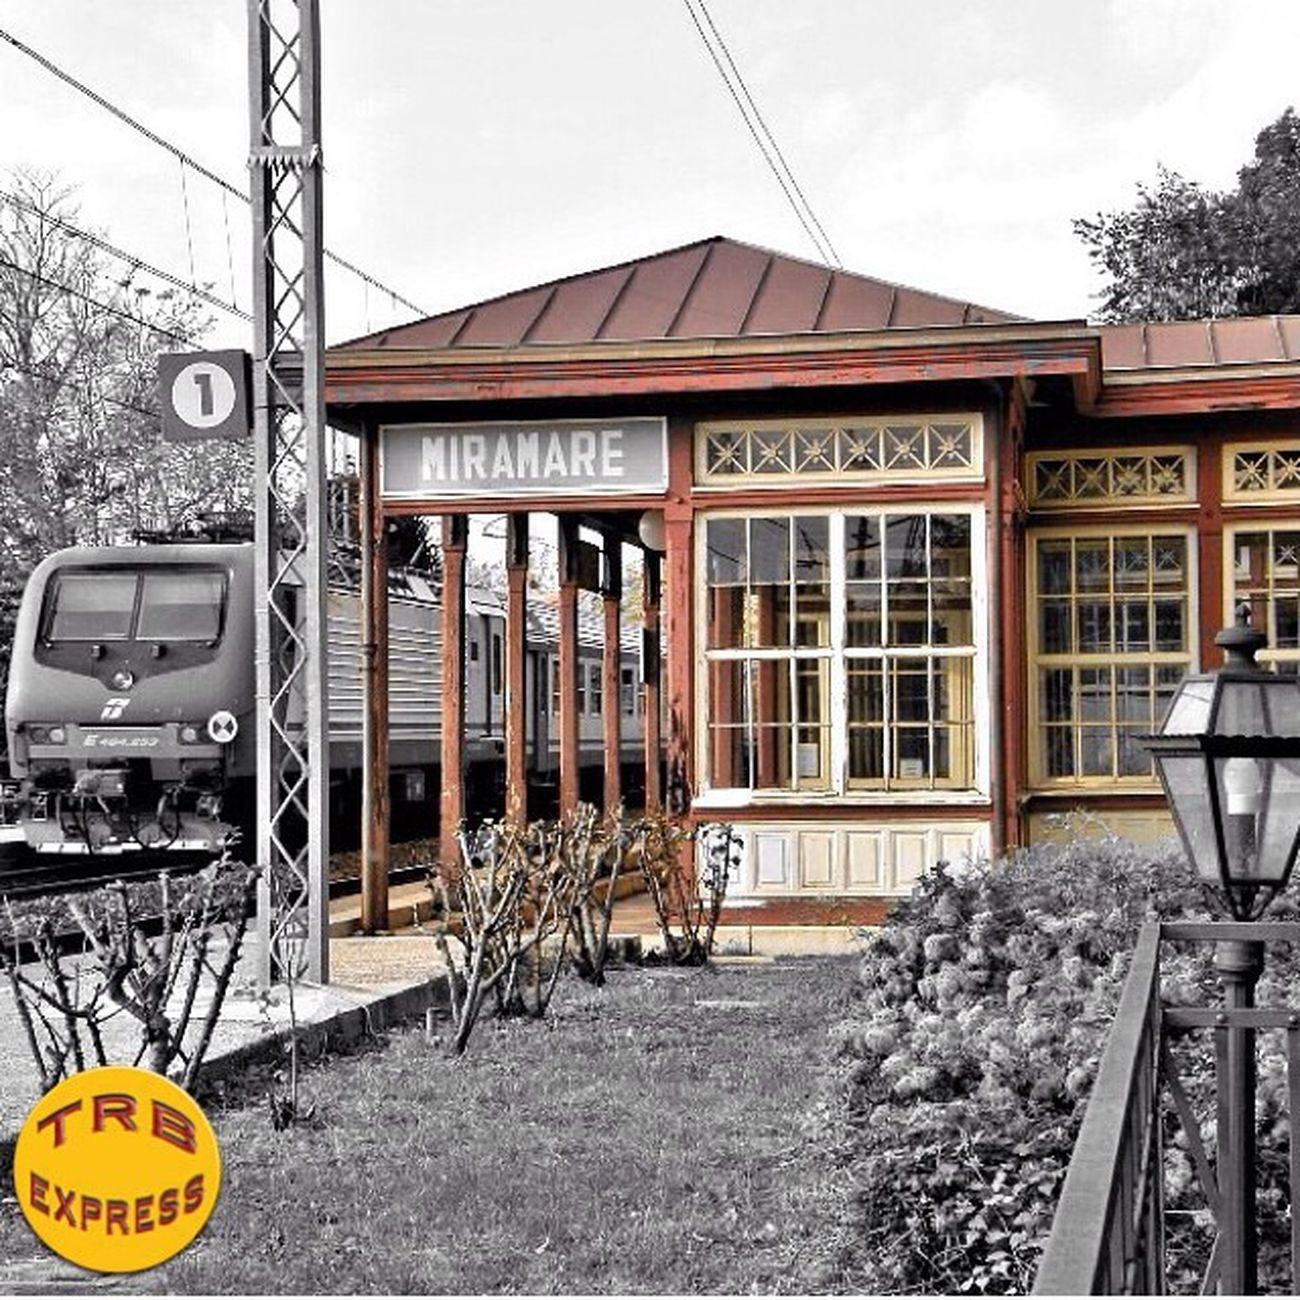 Trains_worldwide Rail_barons Trailblazers_rurex Trb_collabs Trailblazers_urbex Trb_autozone Bipolaroid_asylum Train_nerds Trainphotography Splendid_transport Trb_country Jj_transportation Ig_photolove Trb_random Trb_bnw Trb_rural Ig_shutterbugs Loves_transports Trb_express Railmarkable Railways_of_our_world Railfans_of_instagram Ig_trainspotting Train_of_our_world Trainportal Eisenbahnfotografie